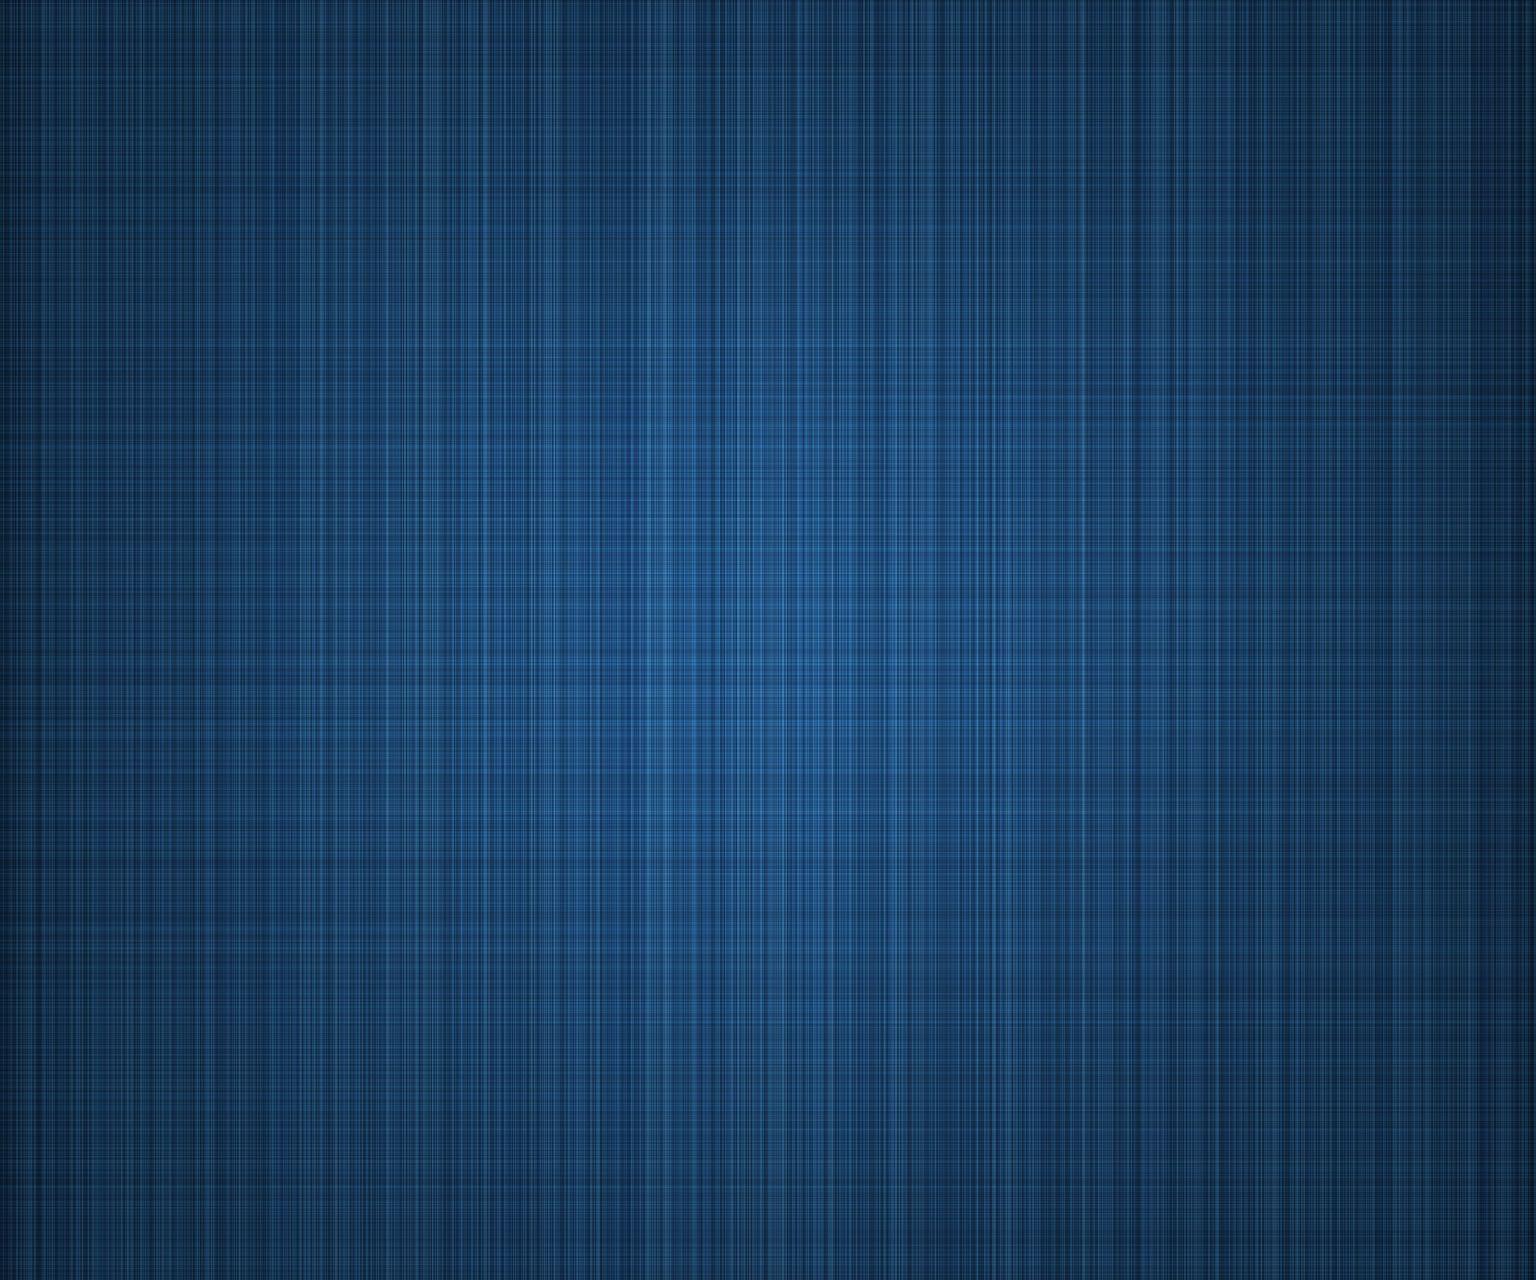 Nexus Wallpapers Free